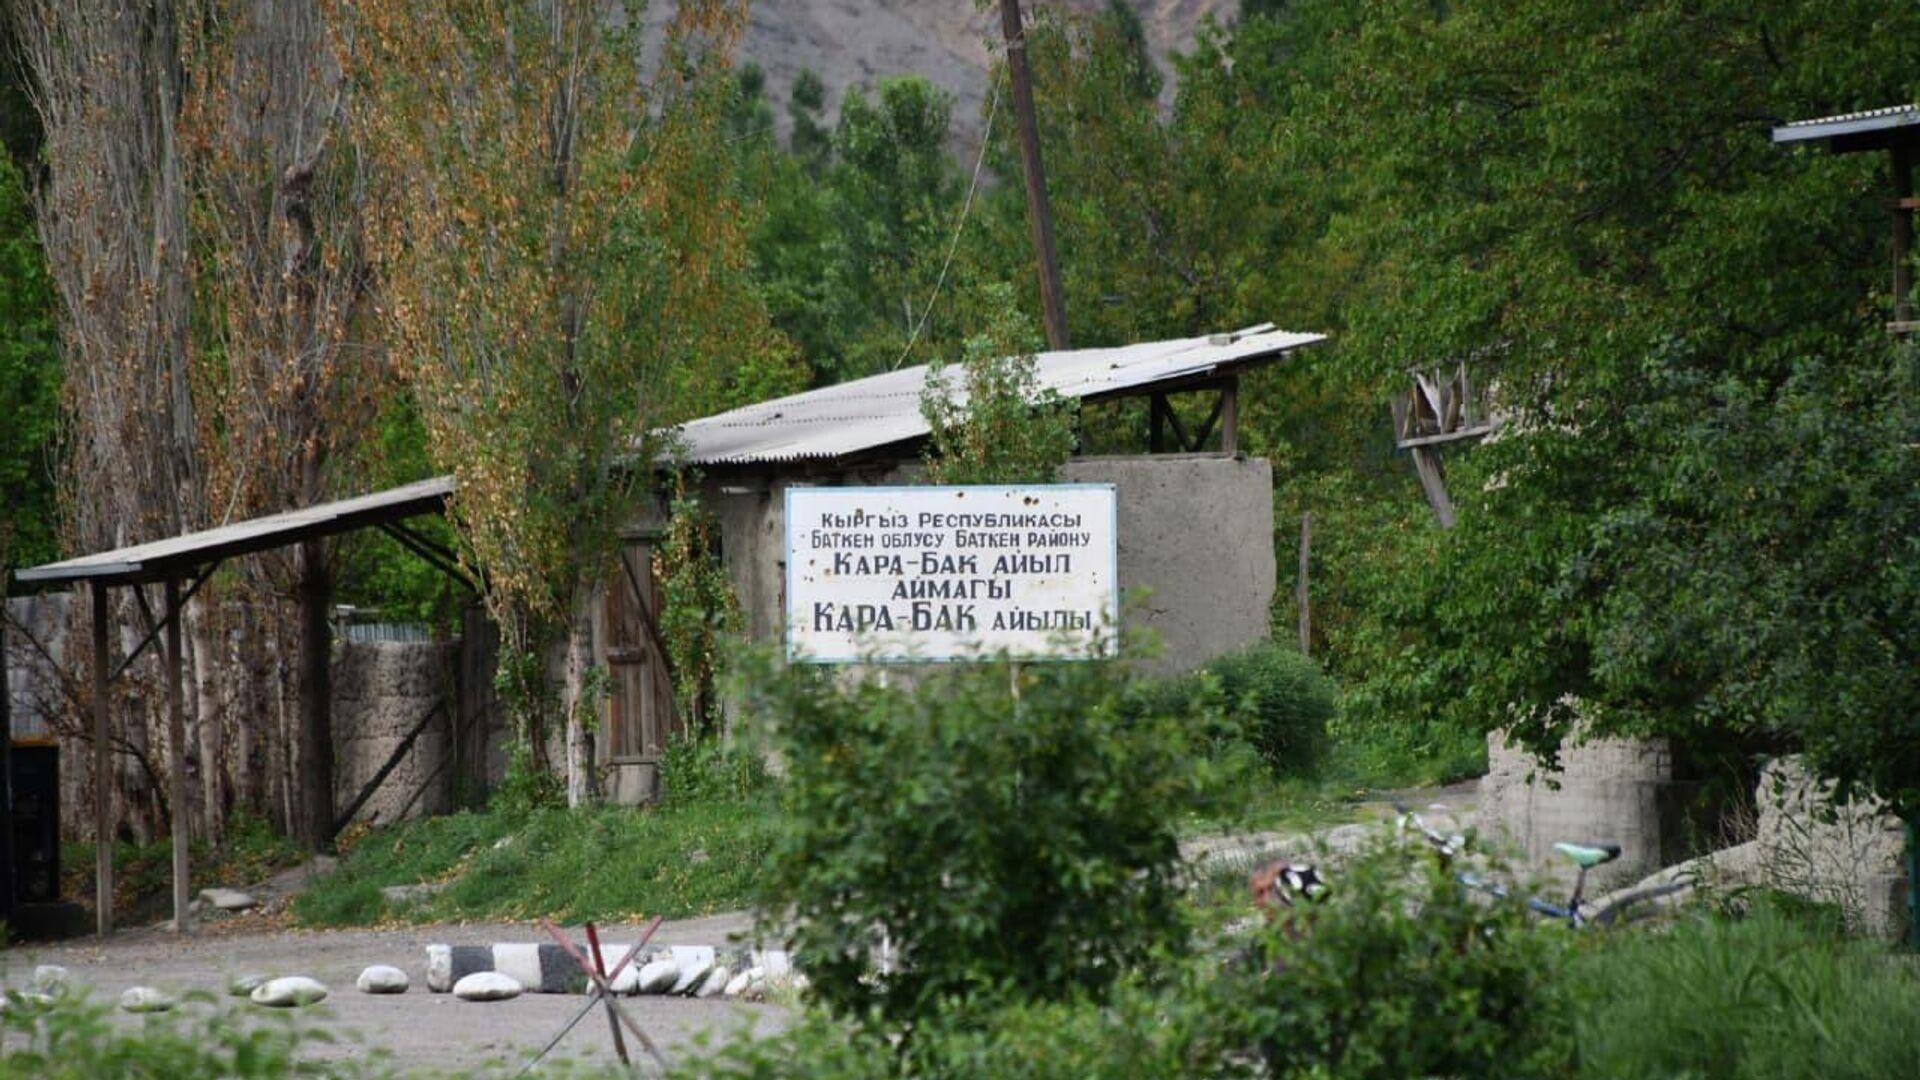 Село Кара-Бак на спорной территории между Кыргызстаном и Таджикистаном - Sputnik Таджикистан, 1920, 23.08.2021